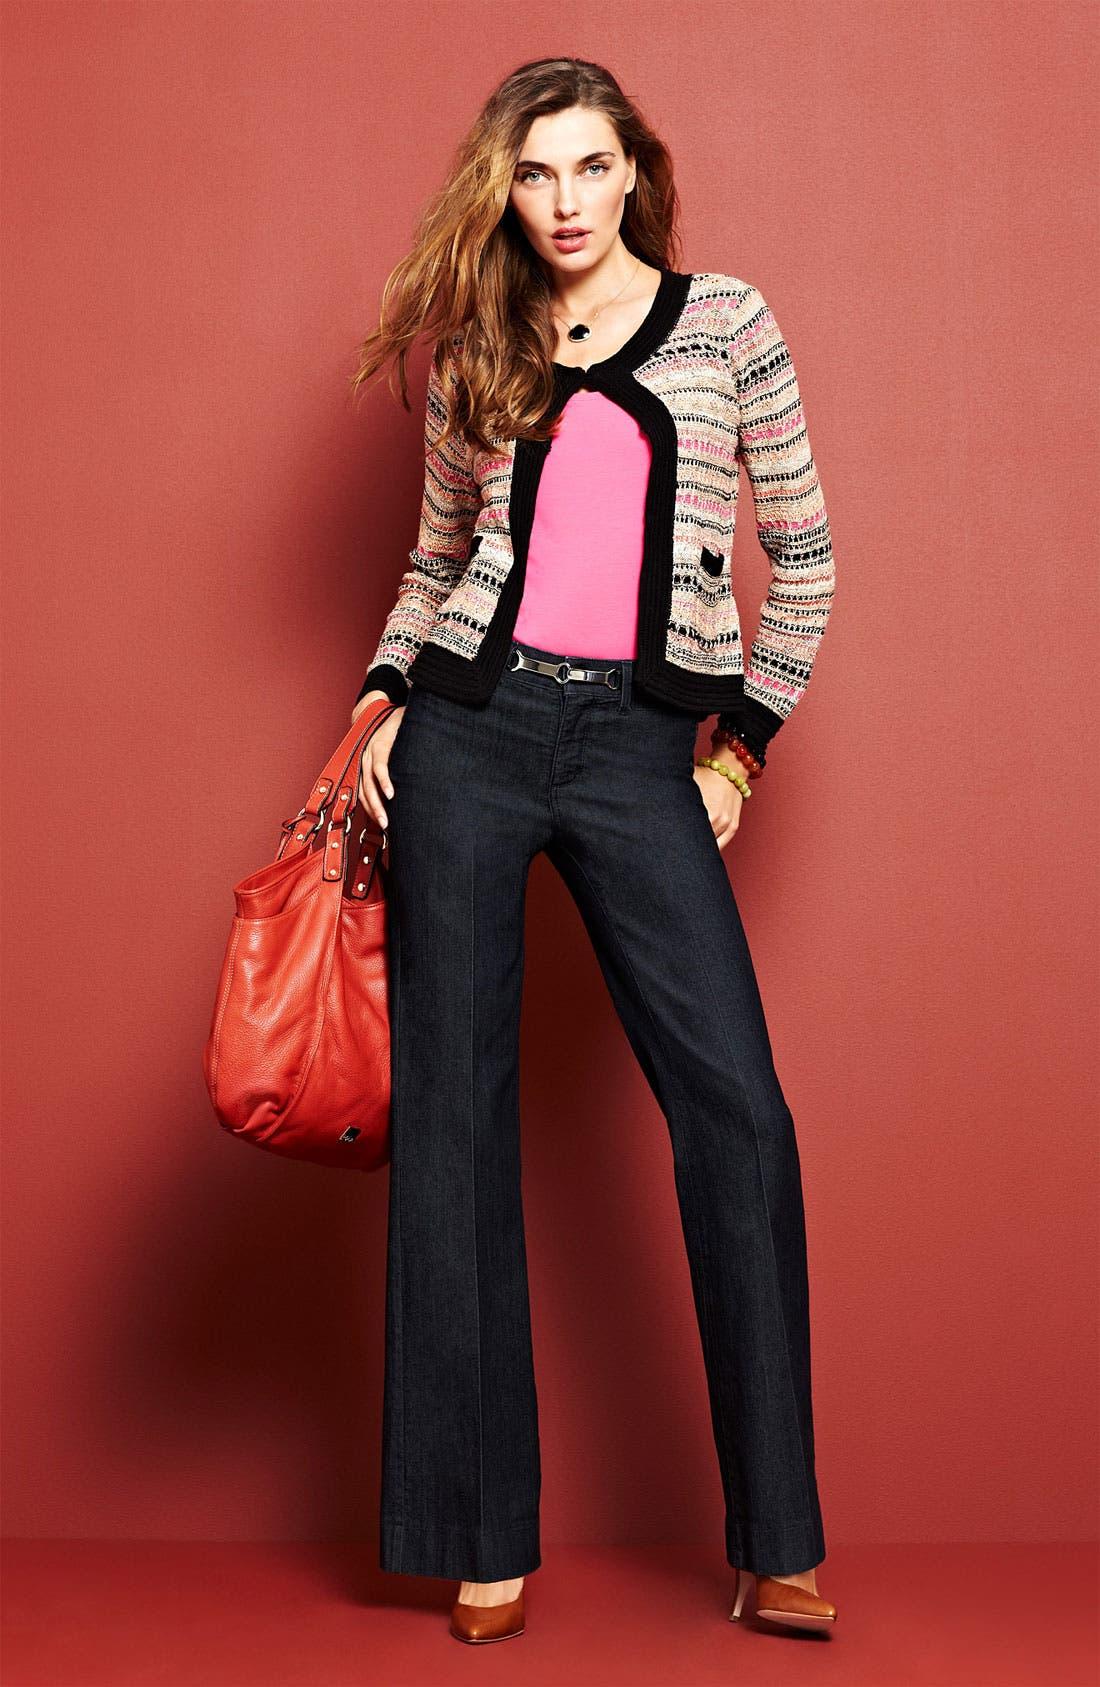 Main Image - Nic + Zoe Cardigan & Tank, NYDJ 'Greta' Jeans